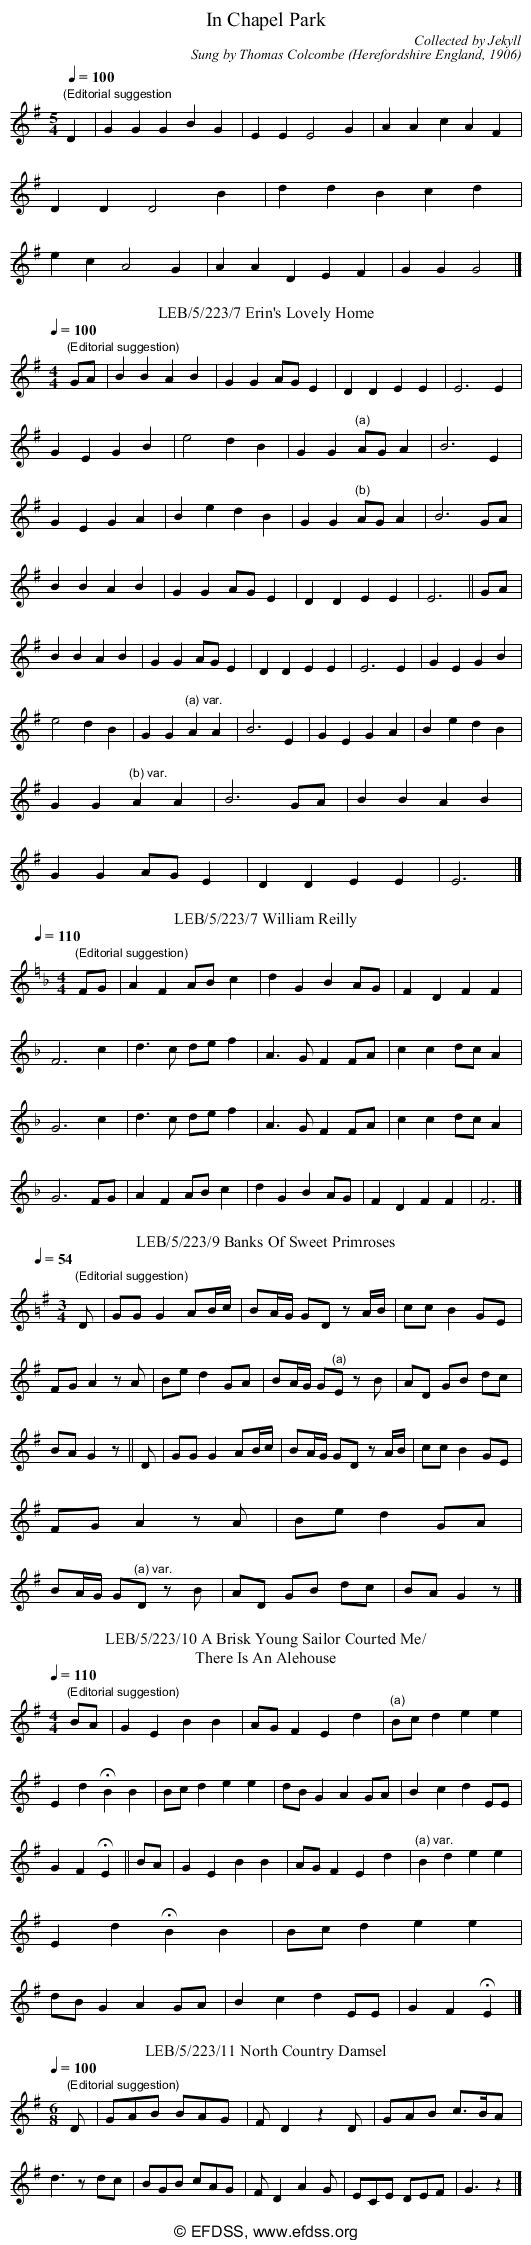 Stave transcription of image number 0 for LEB/5/223/11